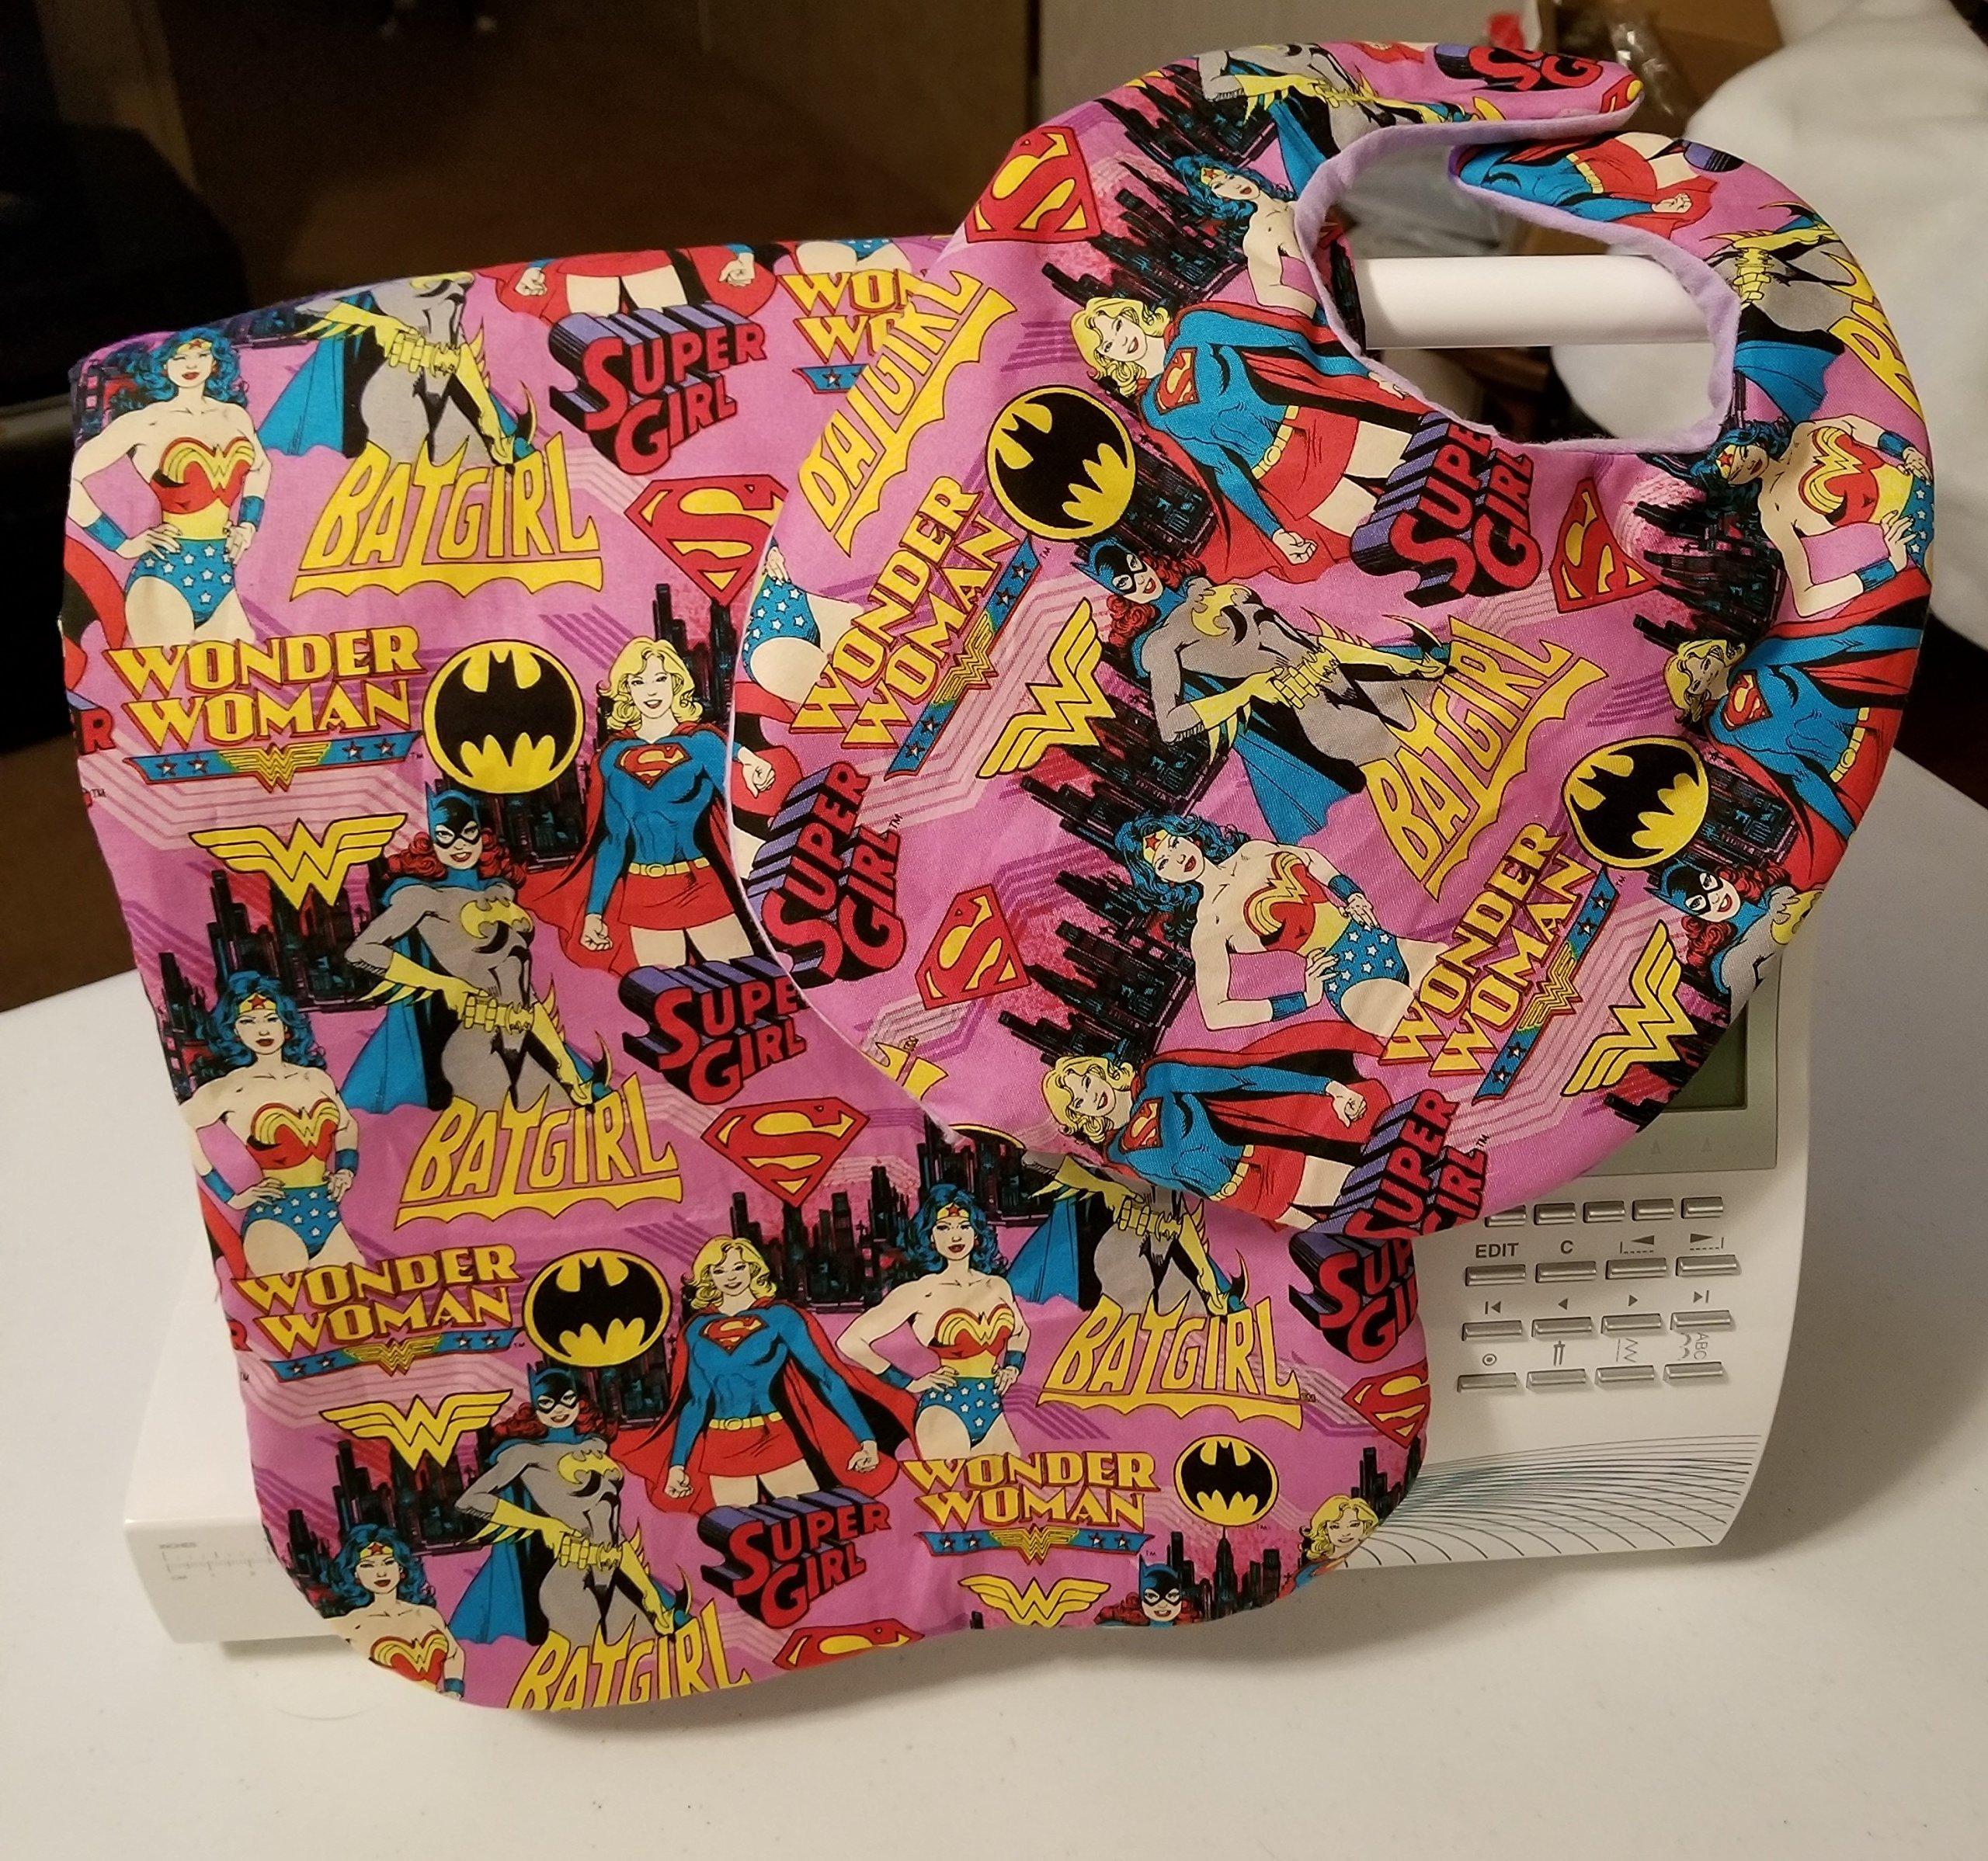 Wonder woman and Bat Girl Bib and Burp Cloth set